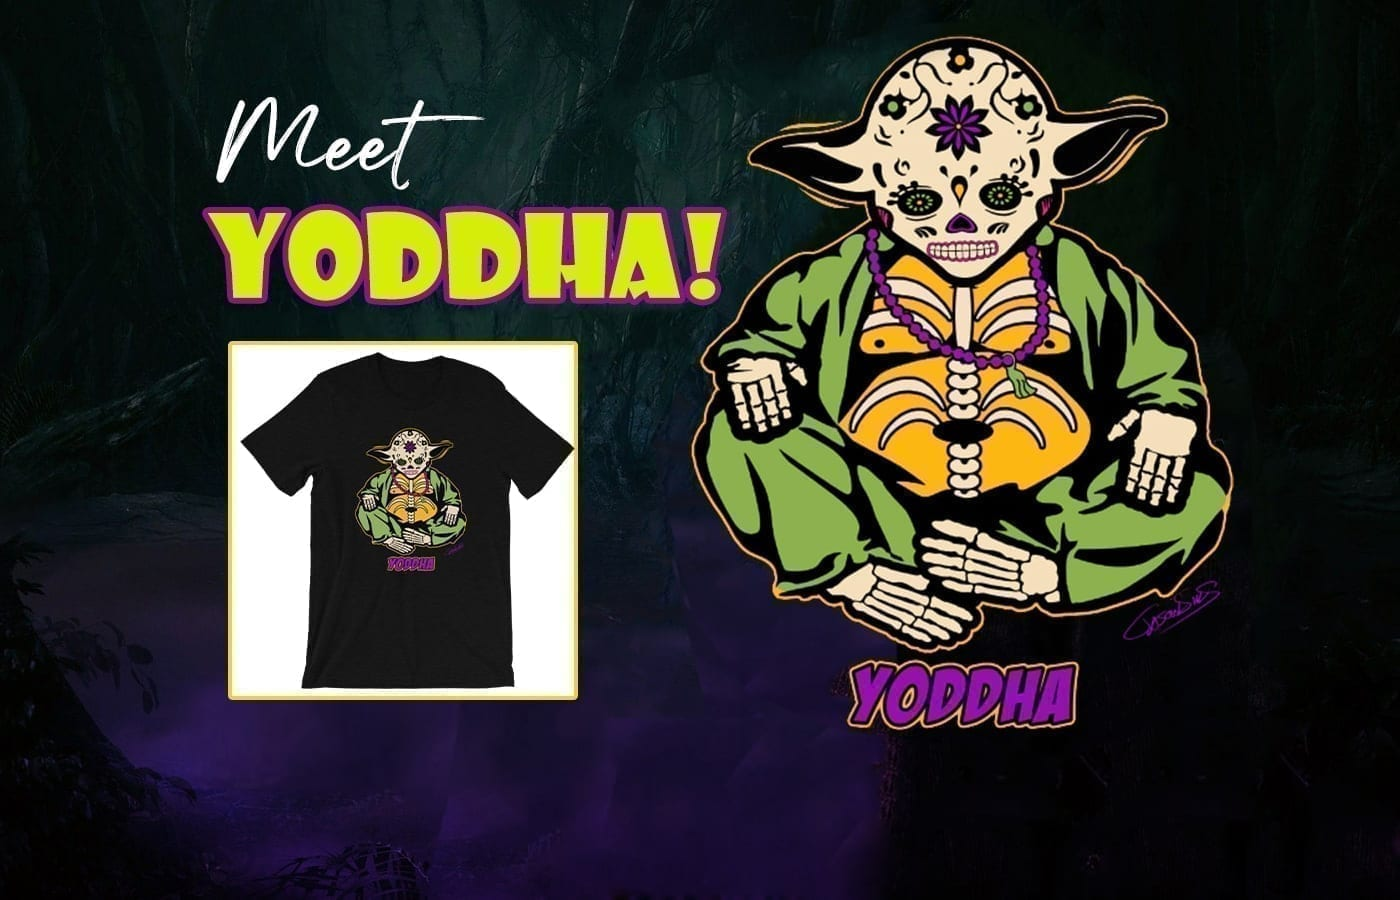 Meet Yoddha!